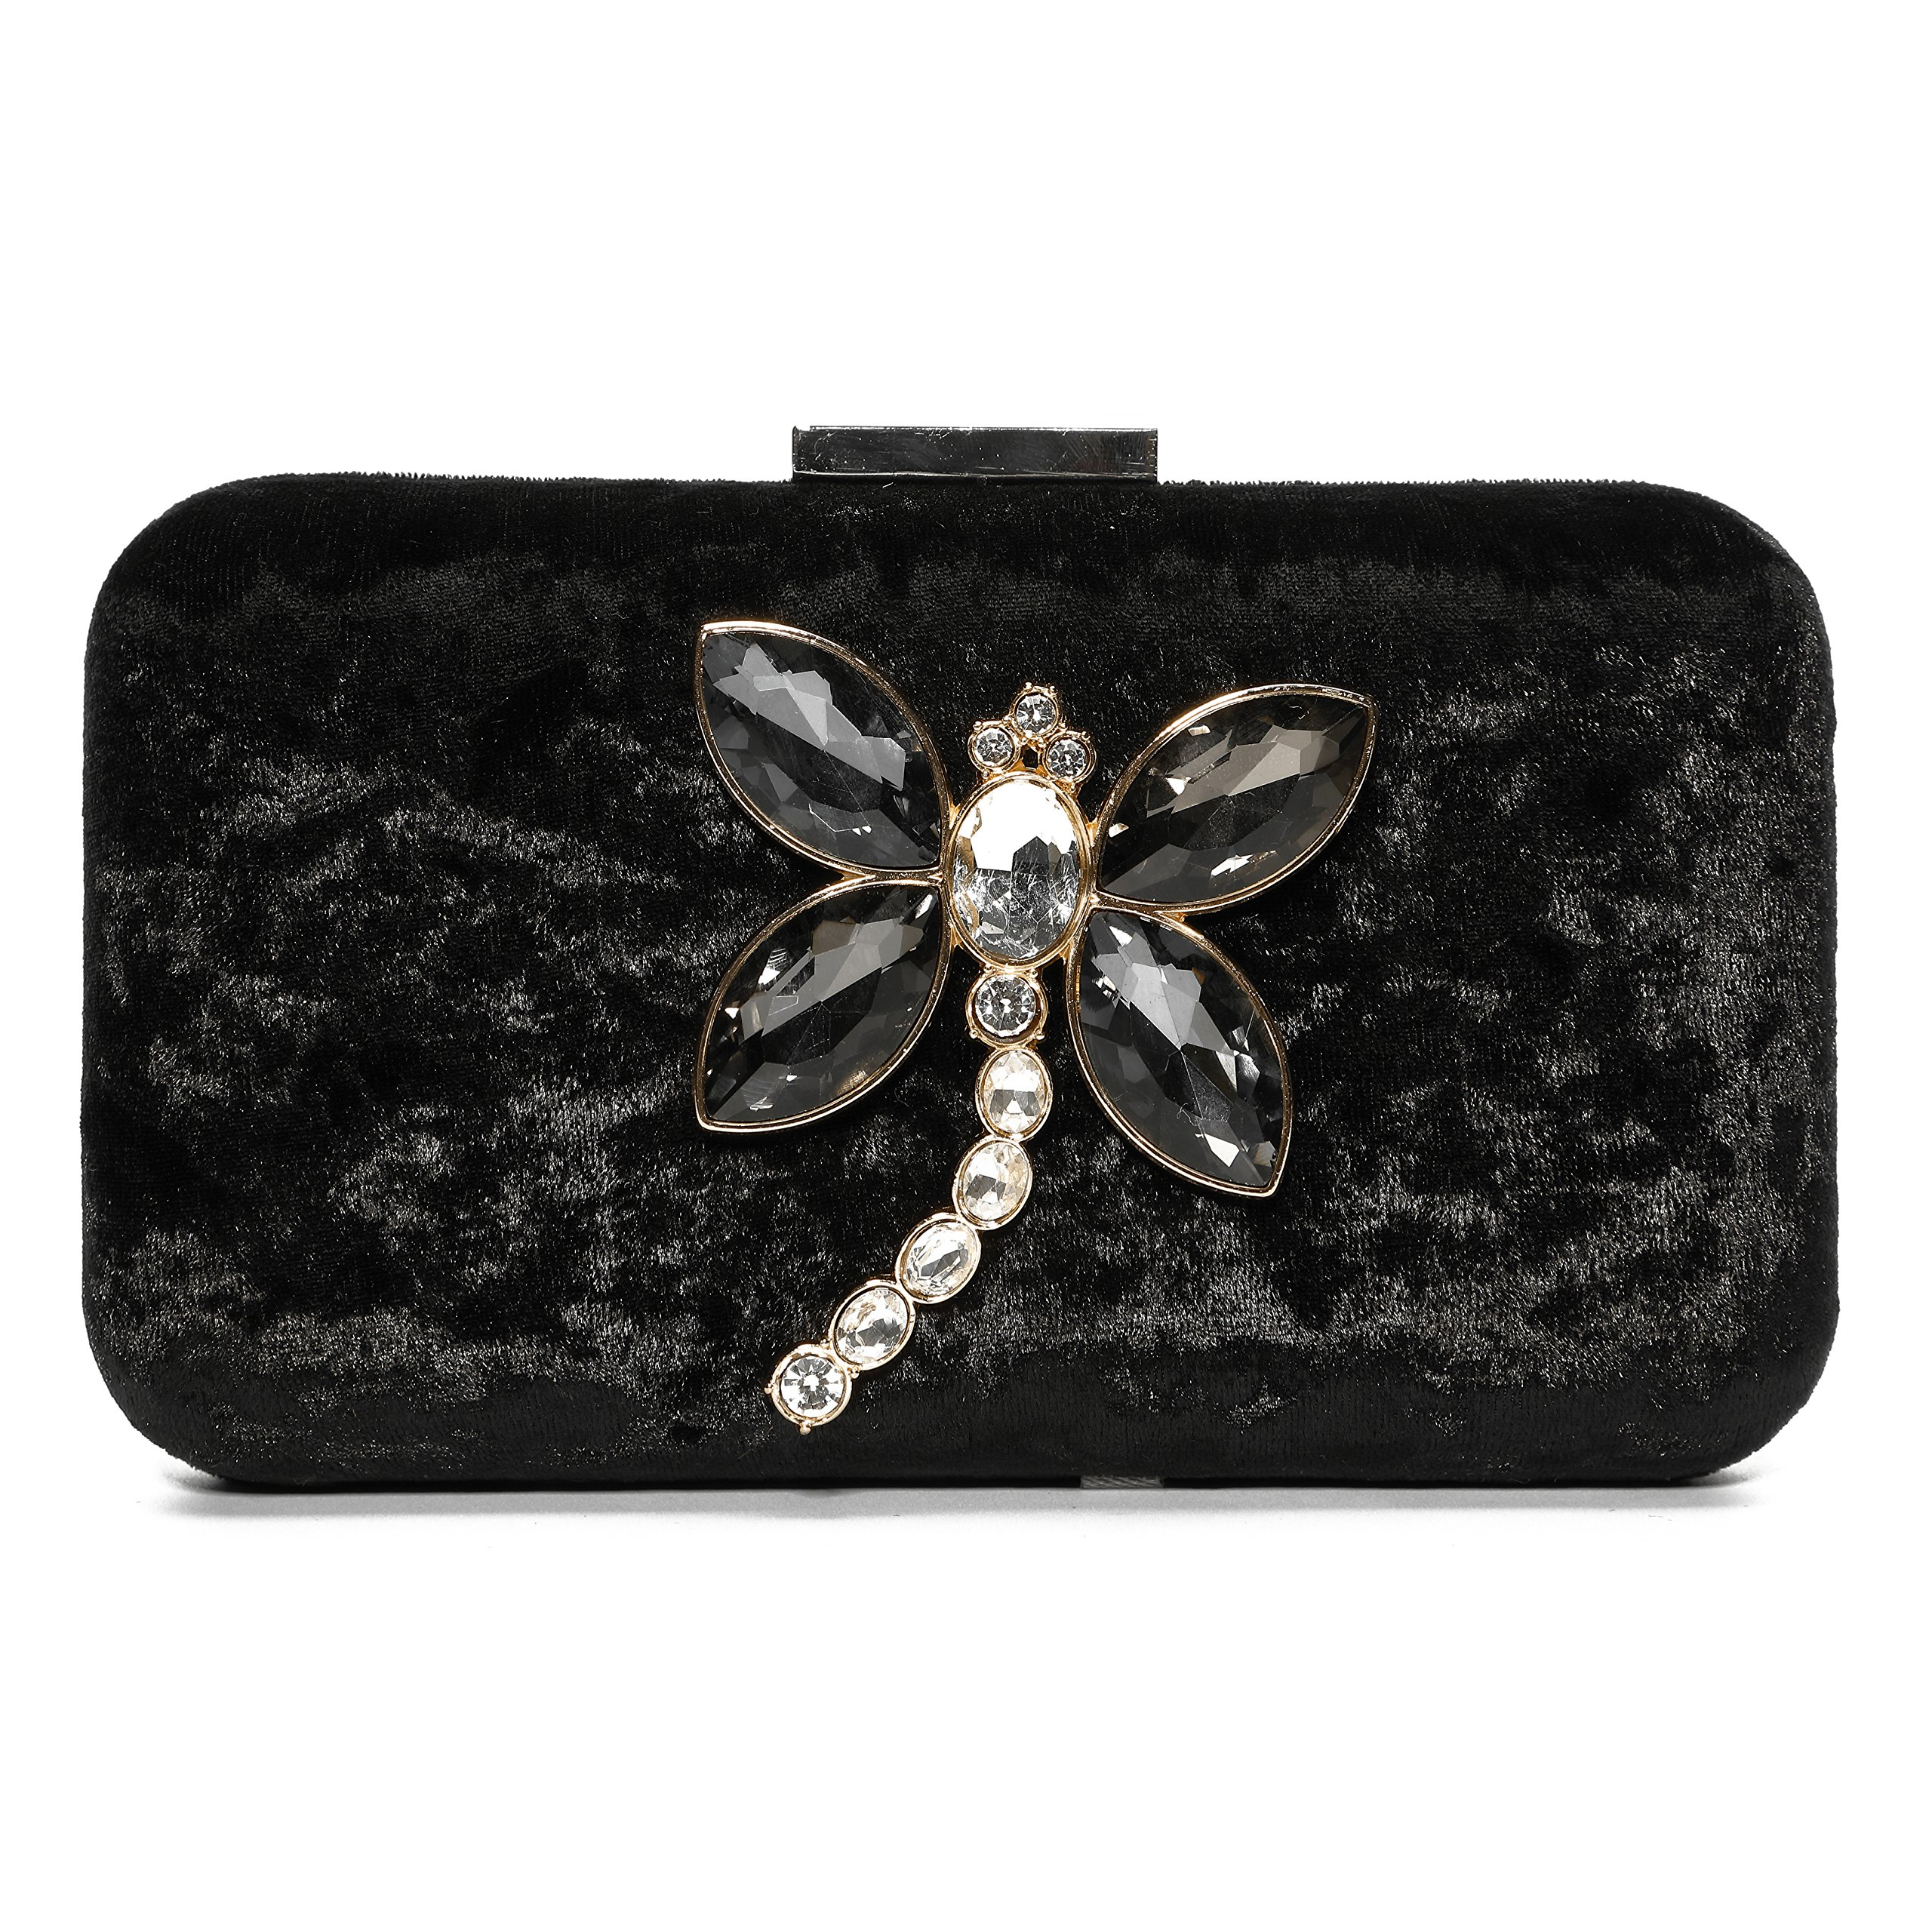 Ali Victory Noble Velvet Colored Diamond Evening Clutch for Women Purse (Black)